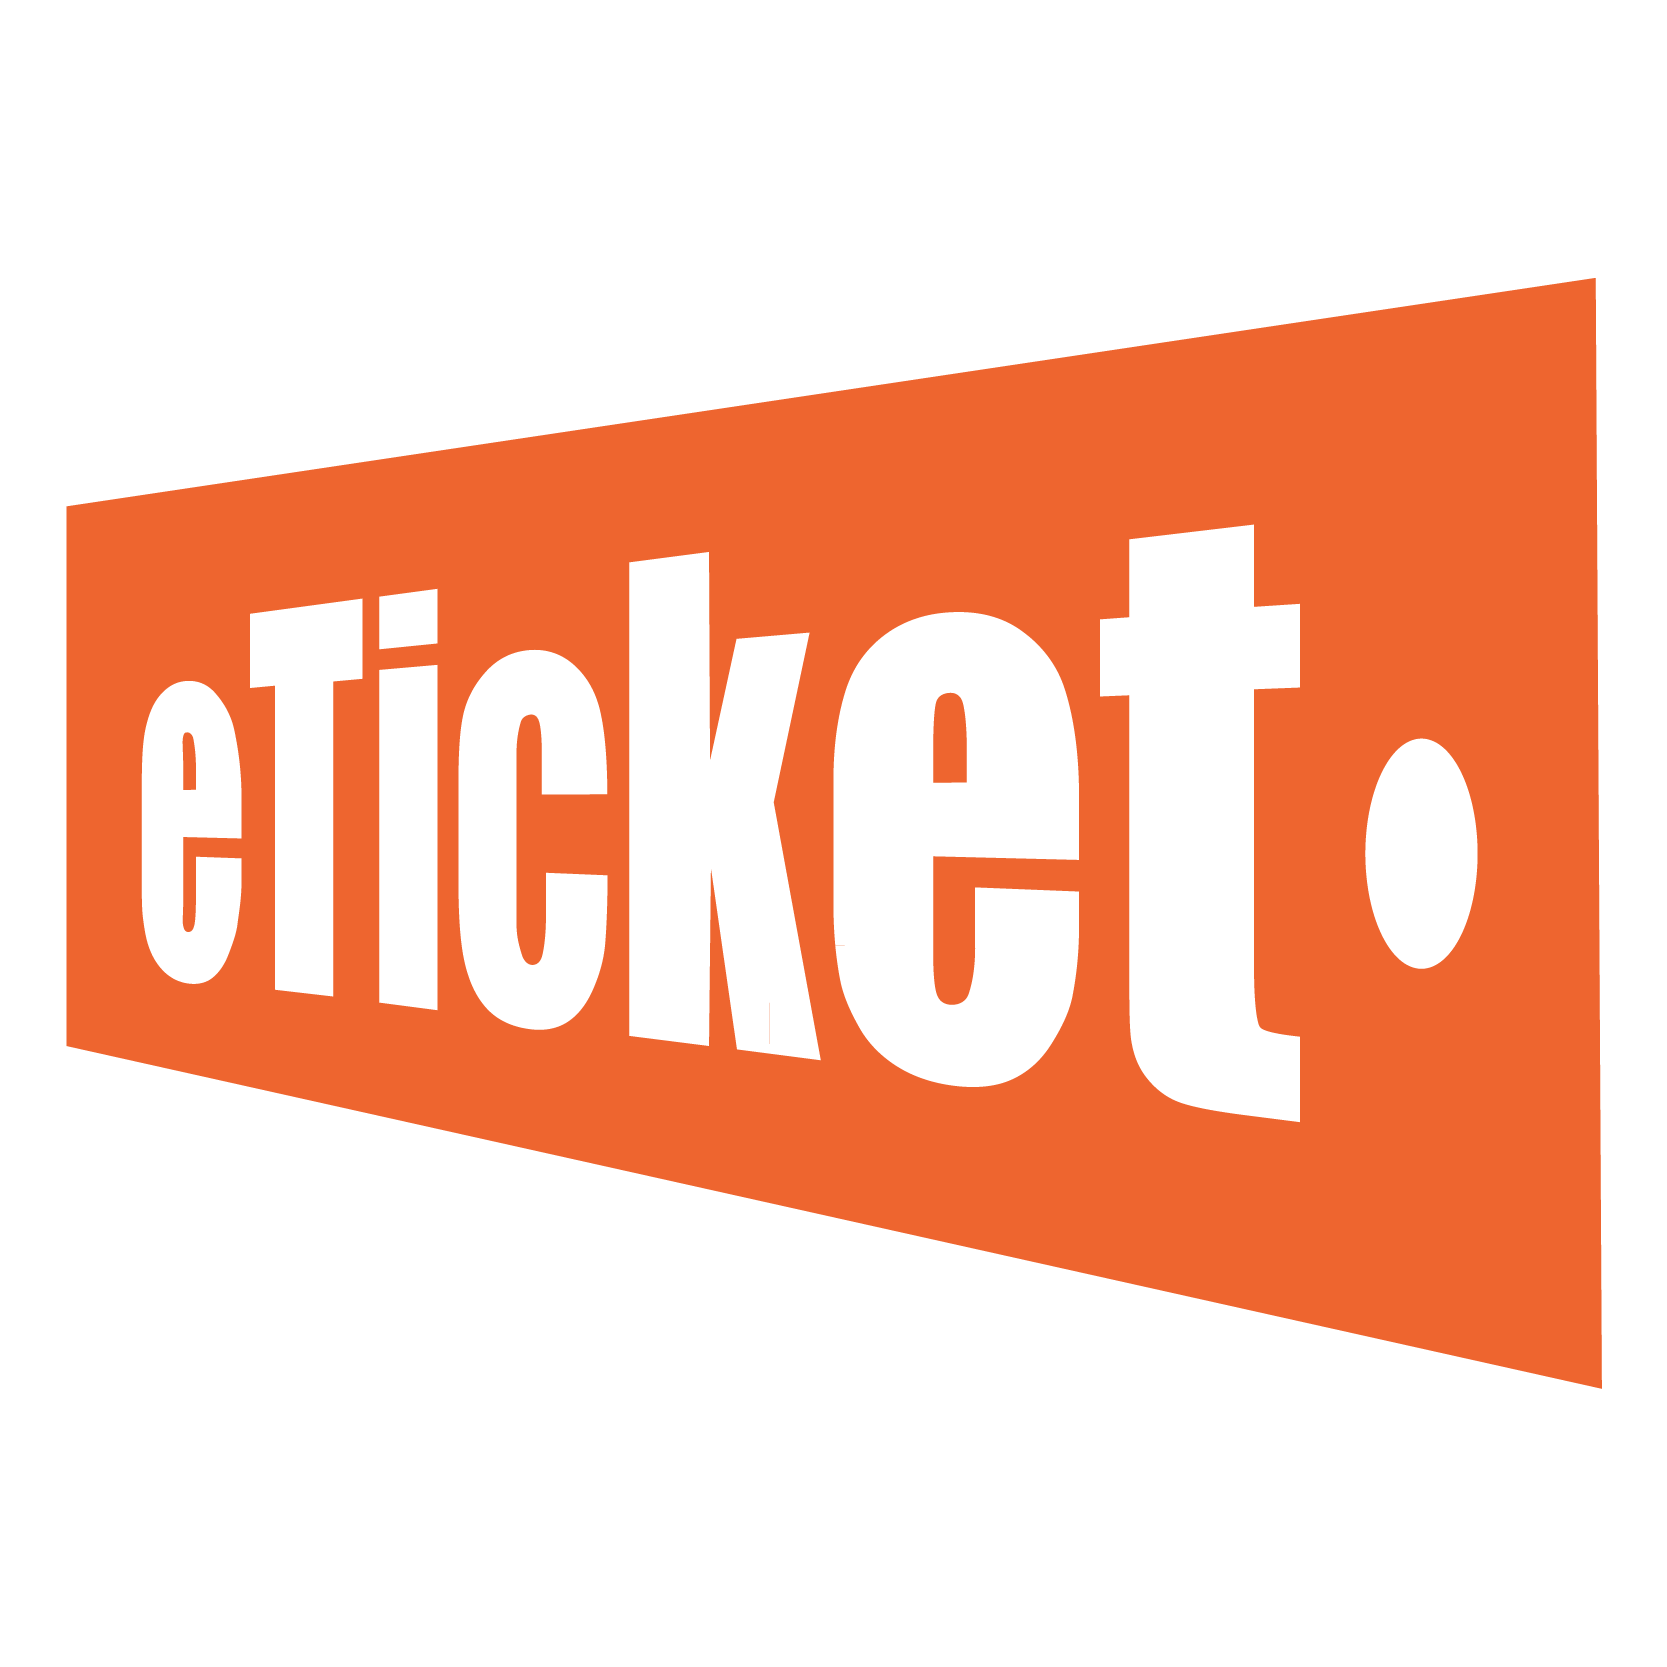 LOGO - eTicket